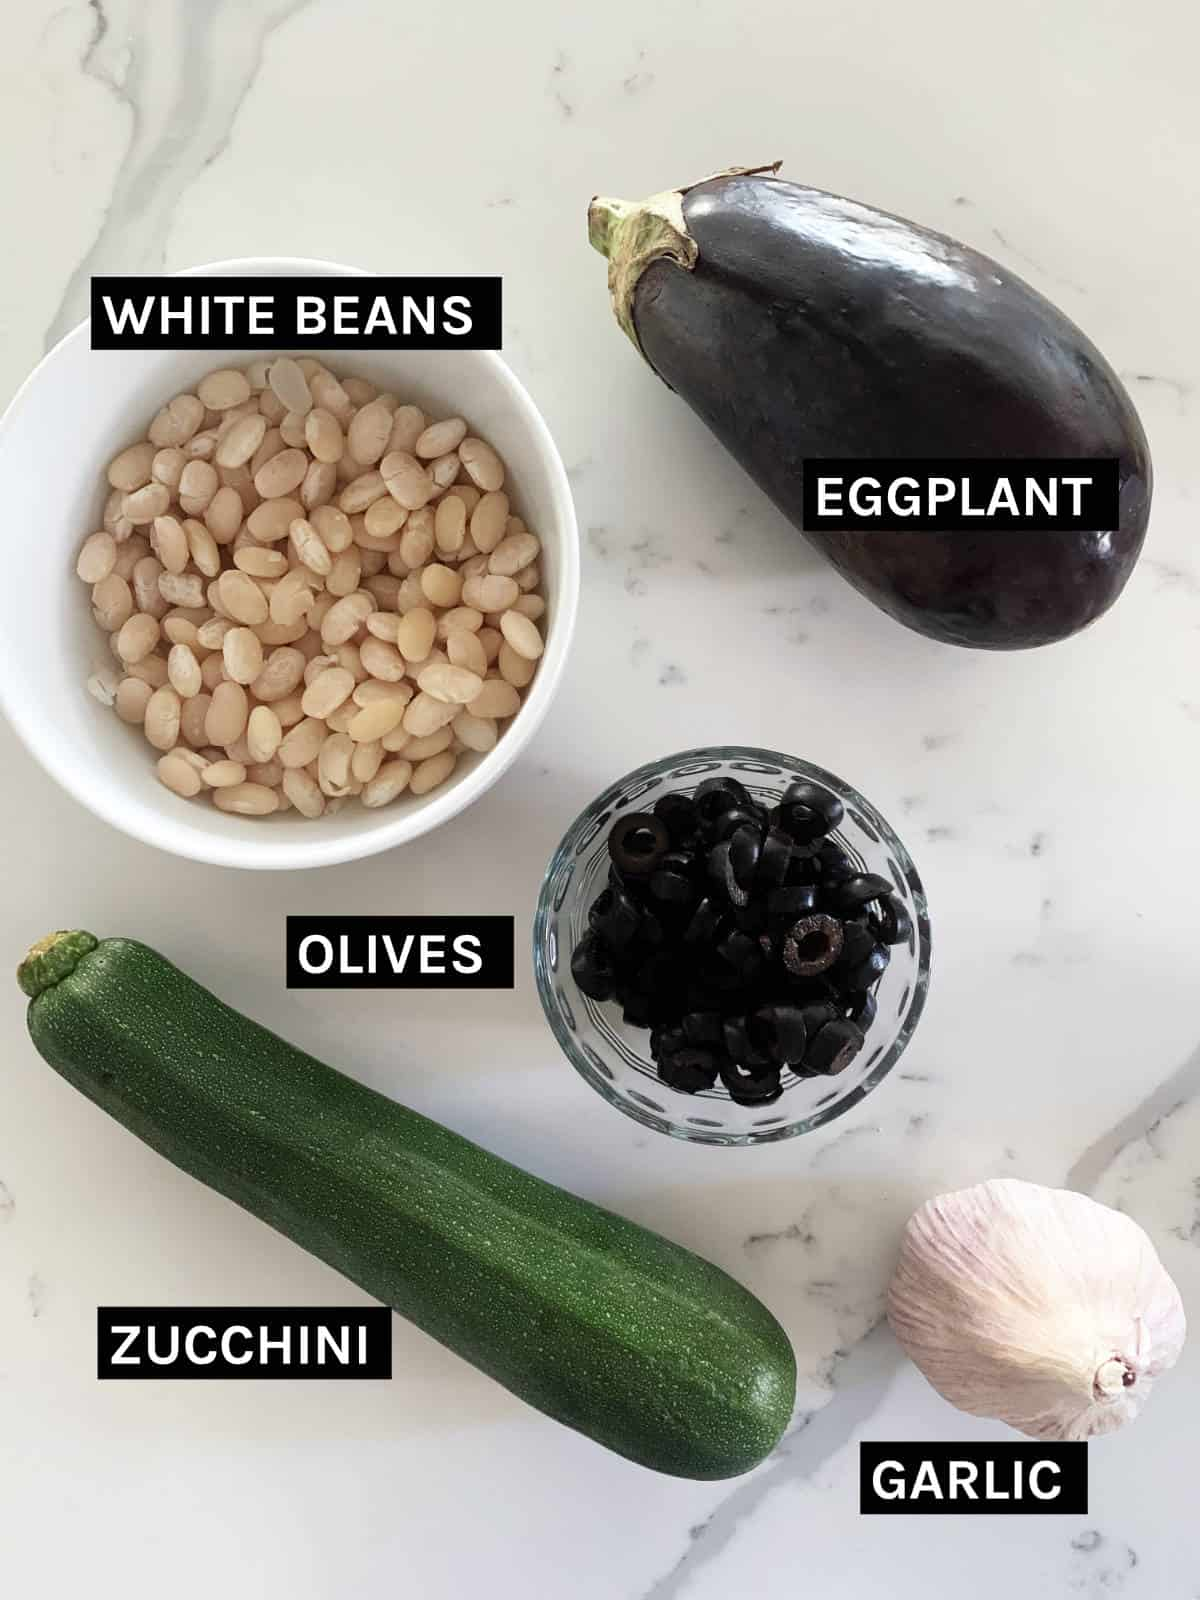 vegan baked pasta ingredients laid out